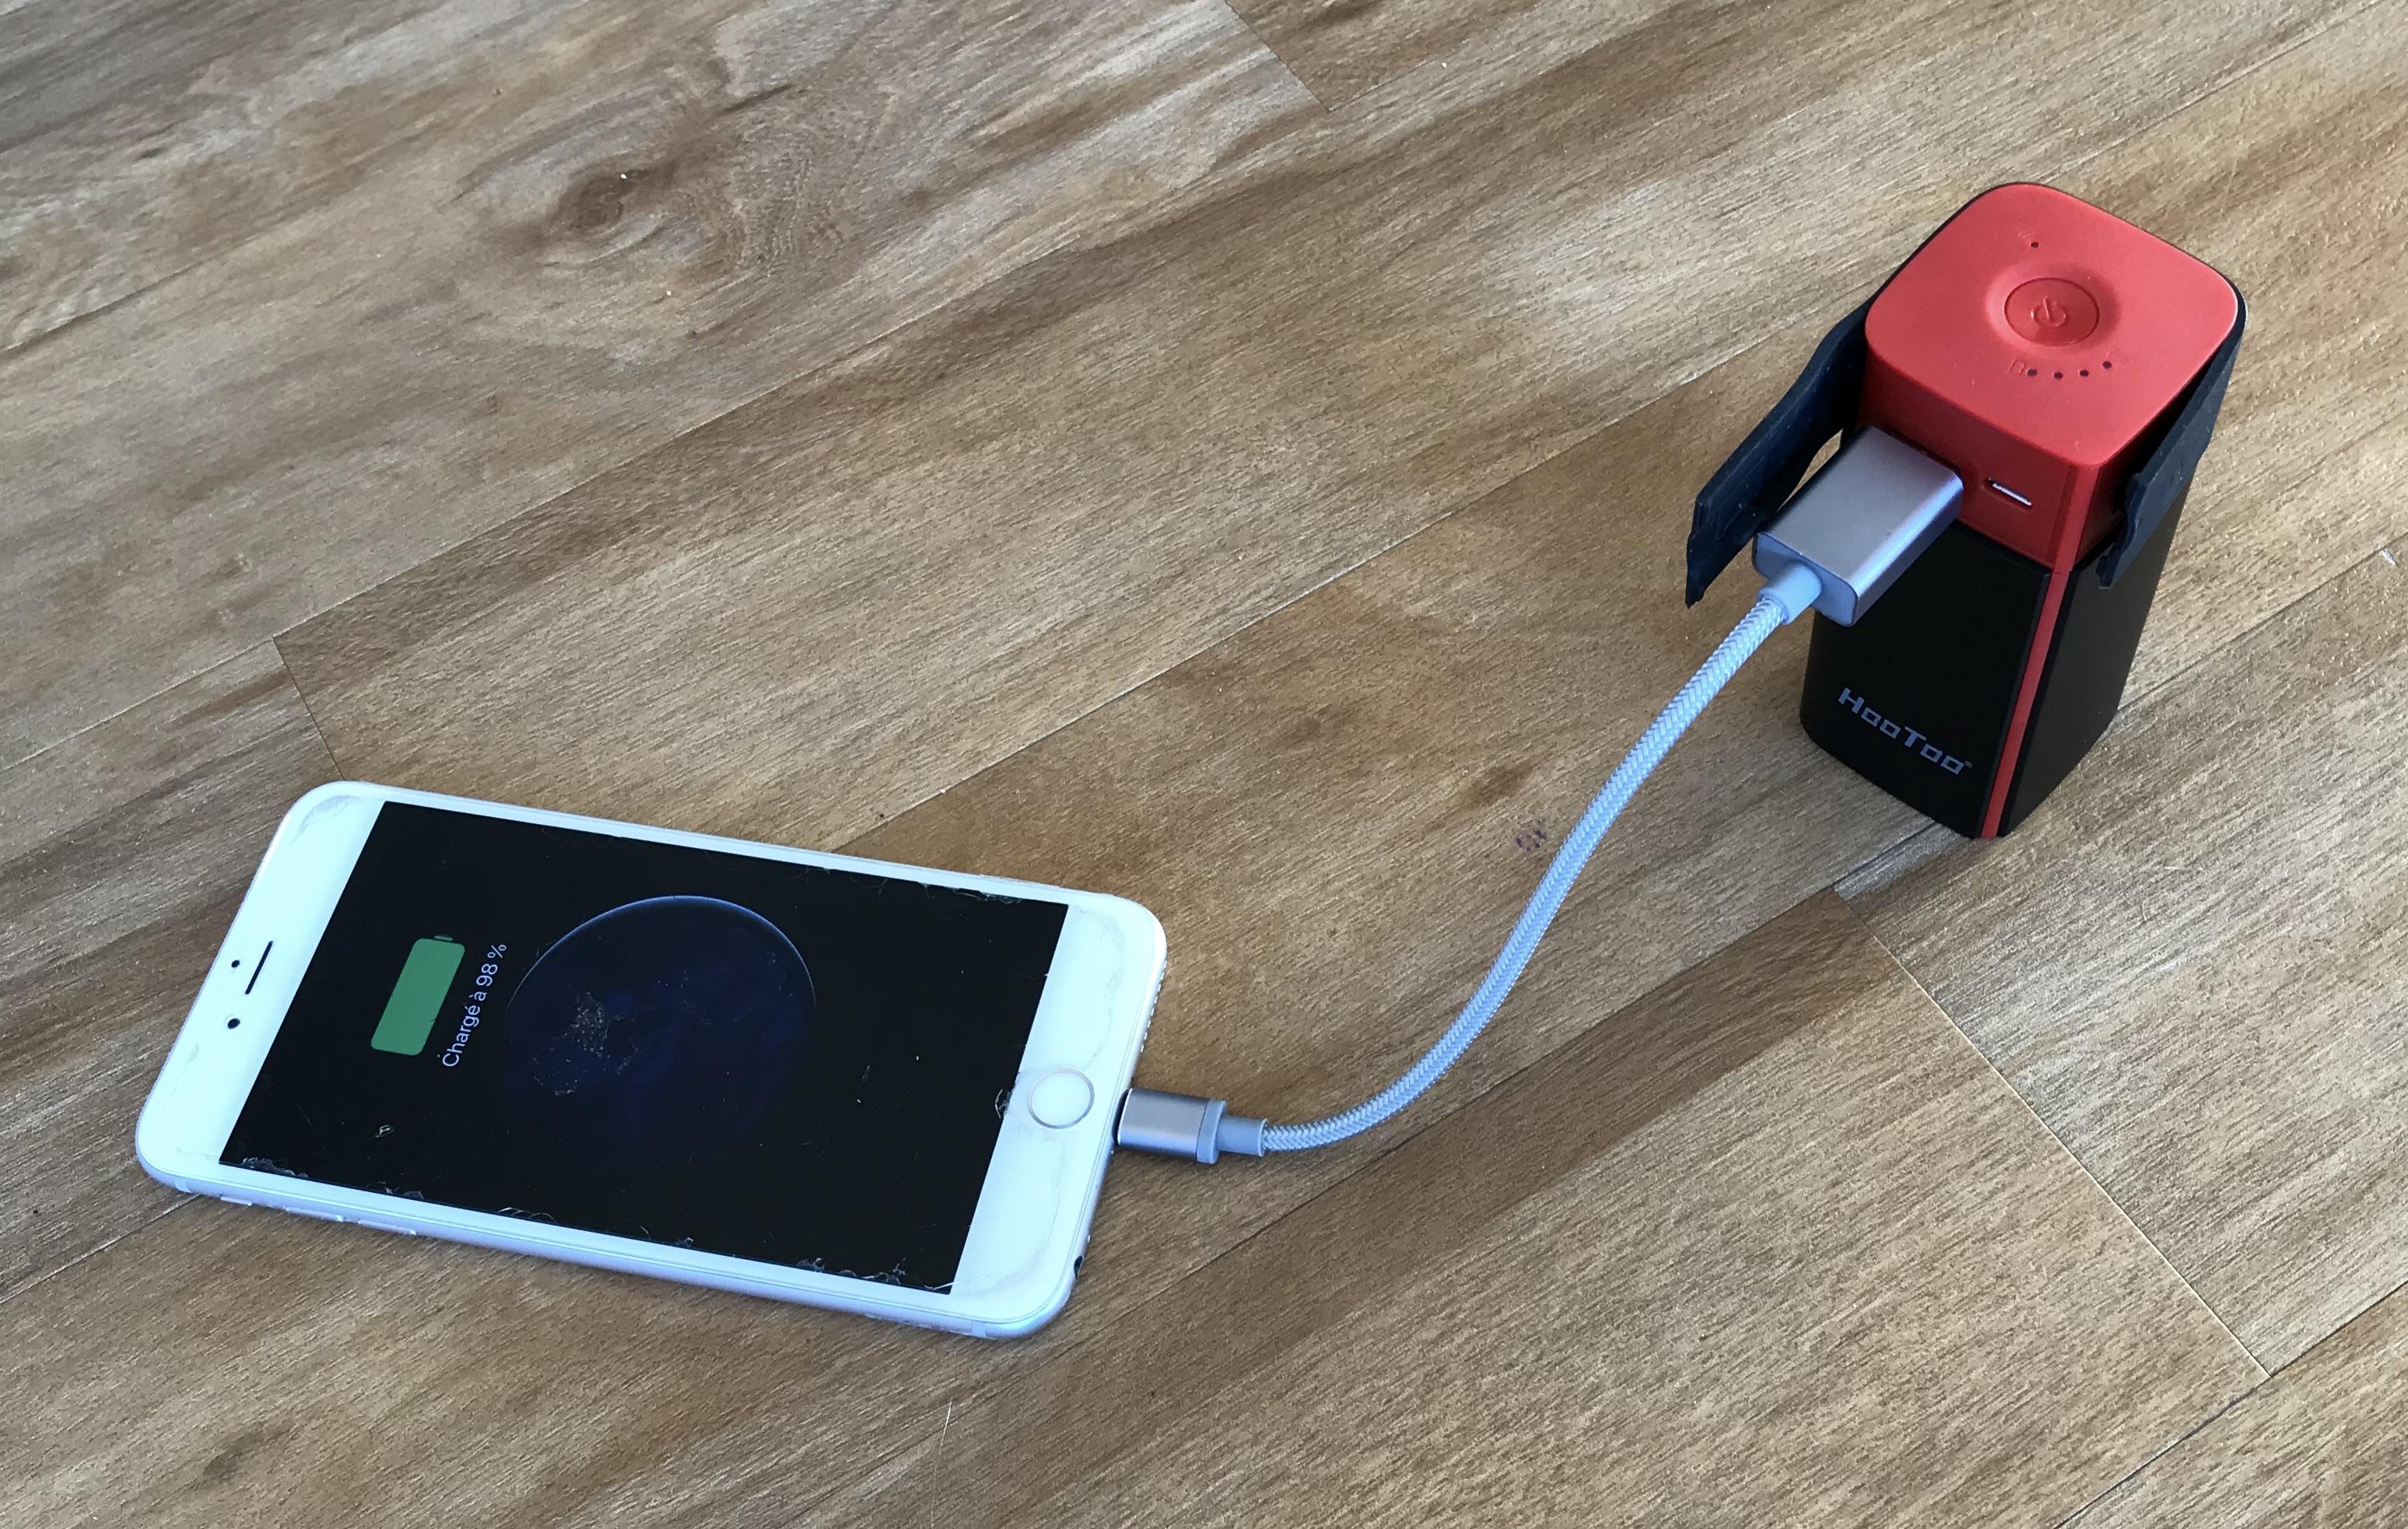 Test du hootoo tripmate titan batterie relais wifi for Antenne relais wifi maison